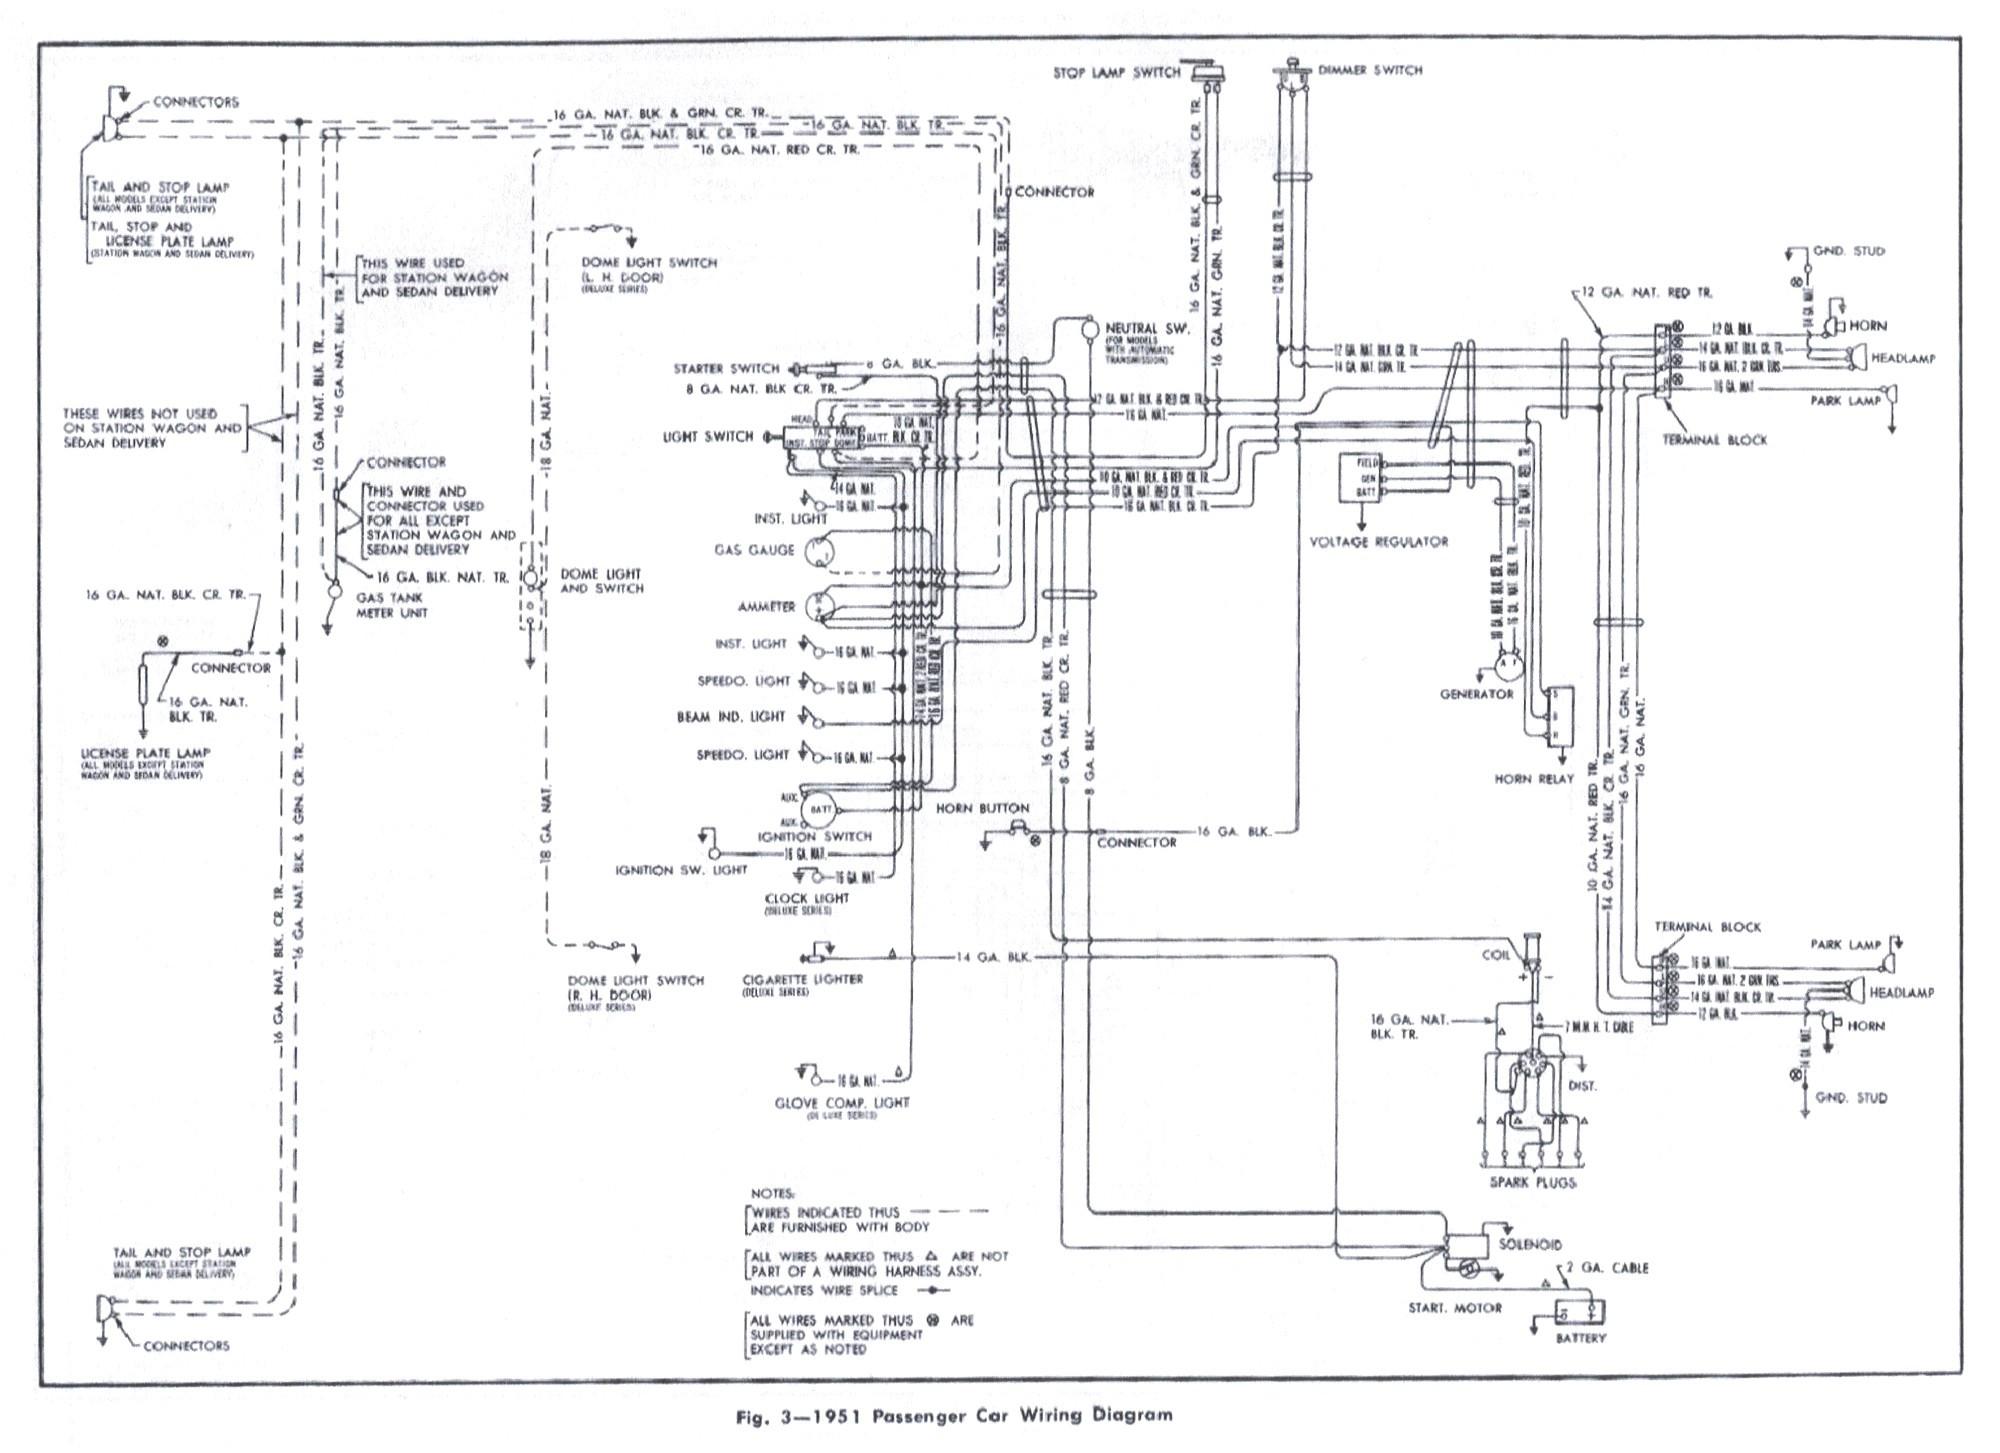 1951 chevrolet wiring diagram